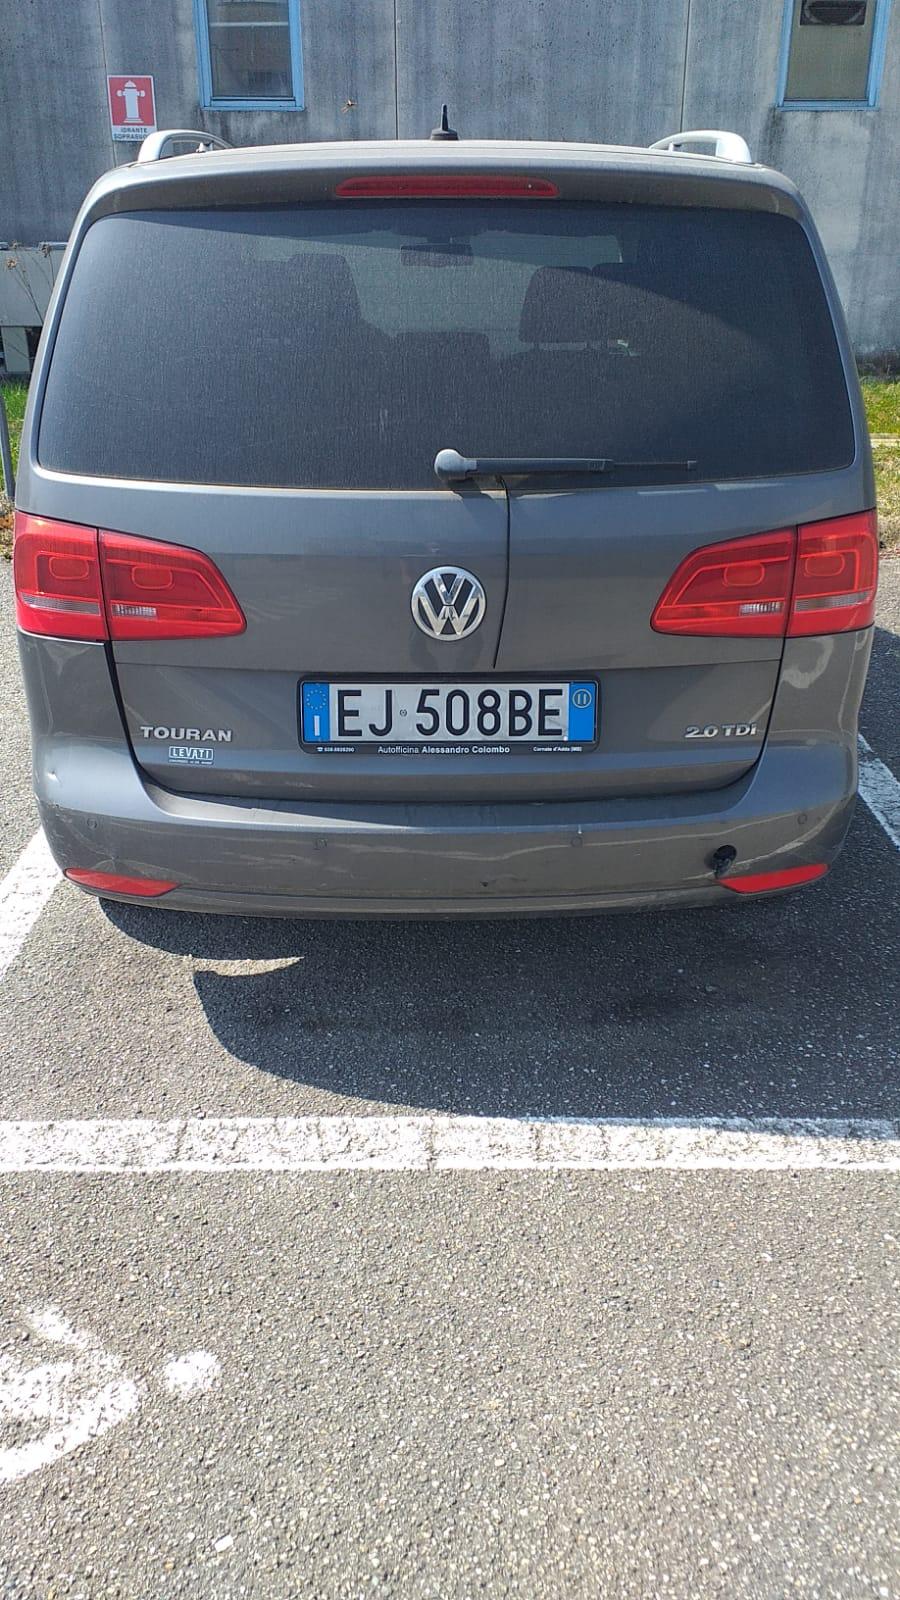 AUTOVETTURA VW TOURAN in vendita - foto 4